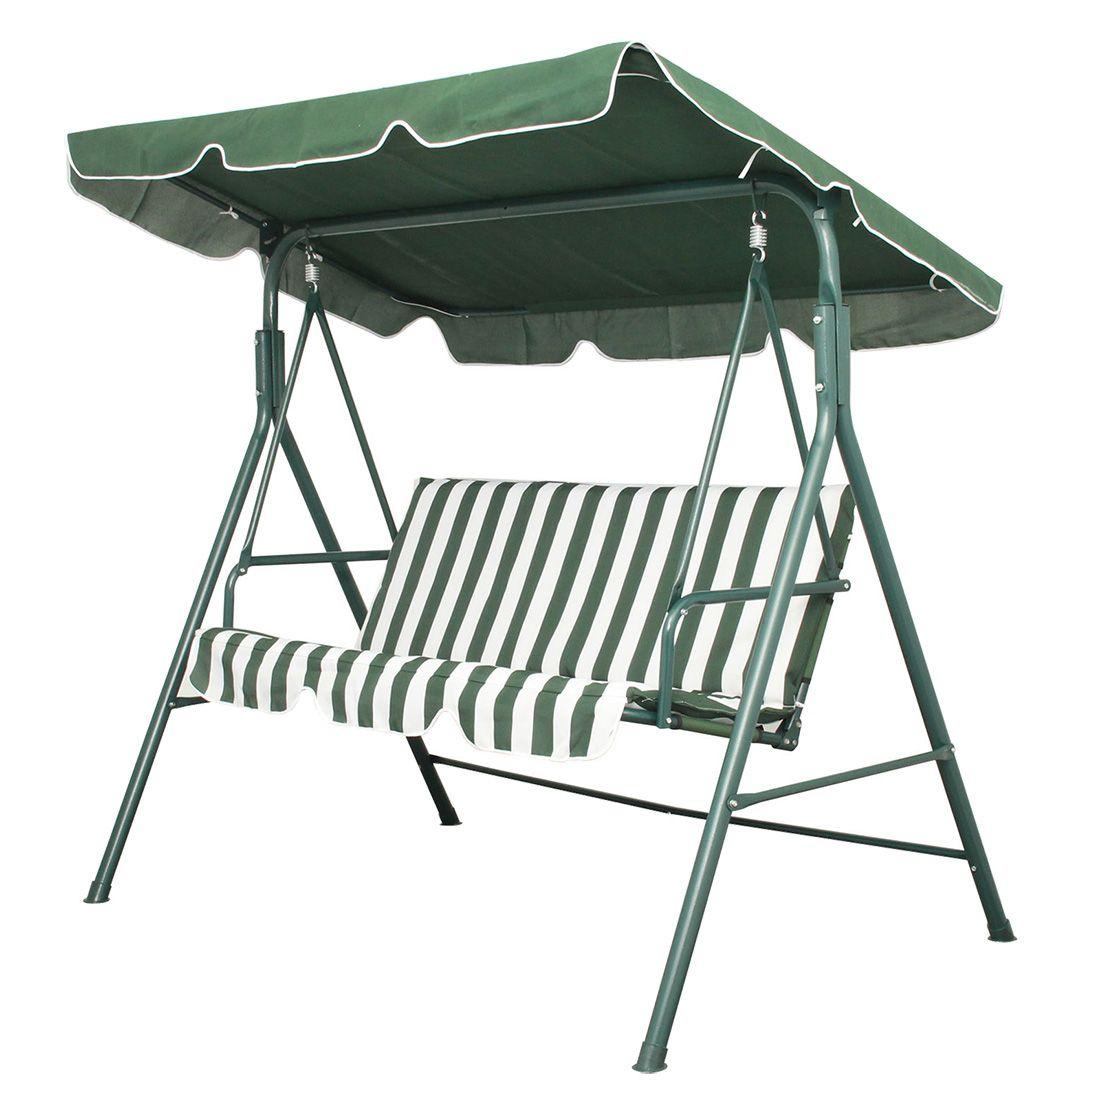 Nhbrgarden patio metal swing chair seat seater hammock bench